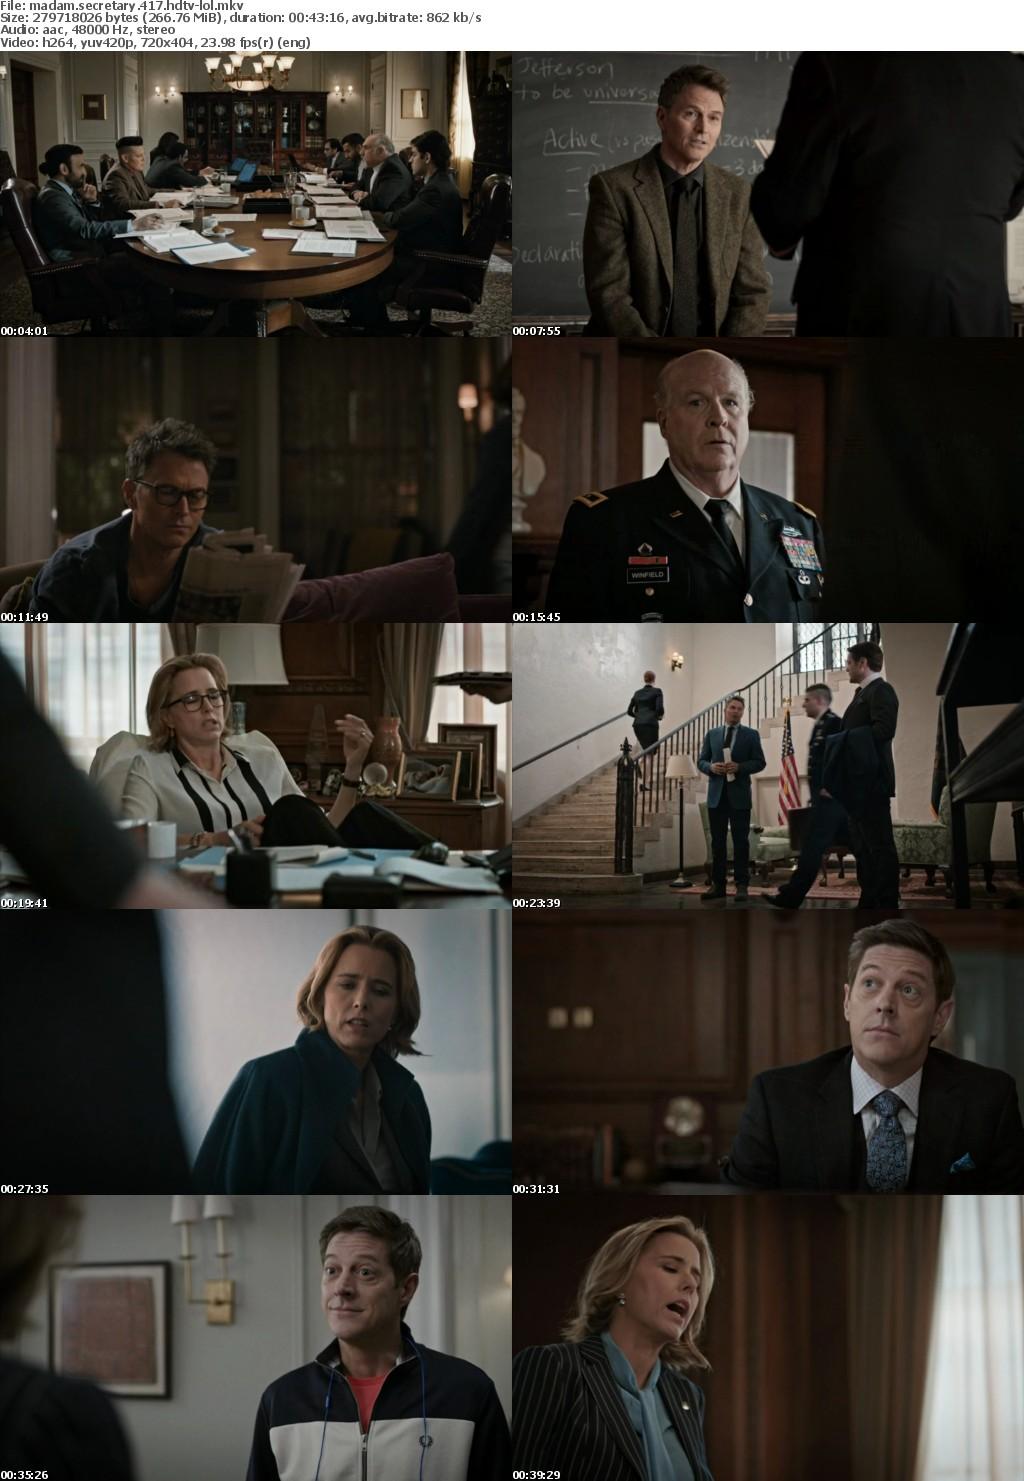 Madam Secretary S04E17 HDTV x264-LOL